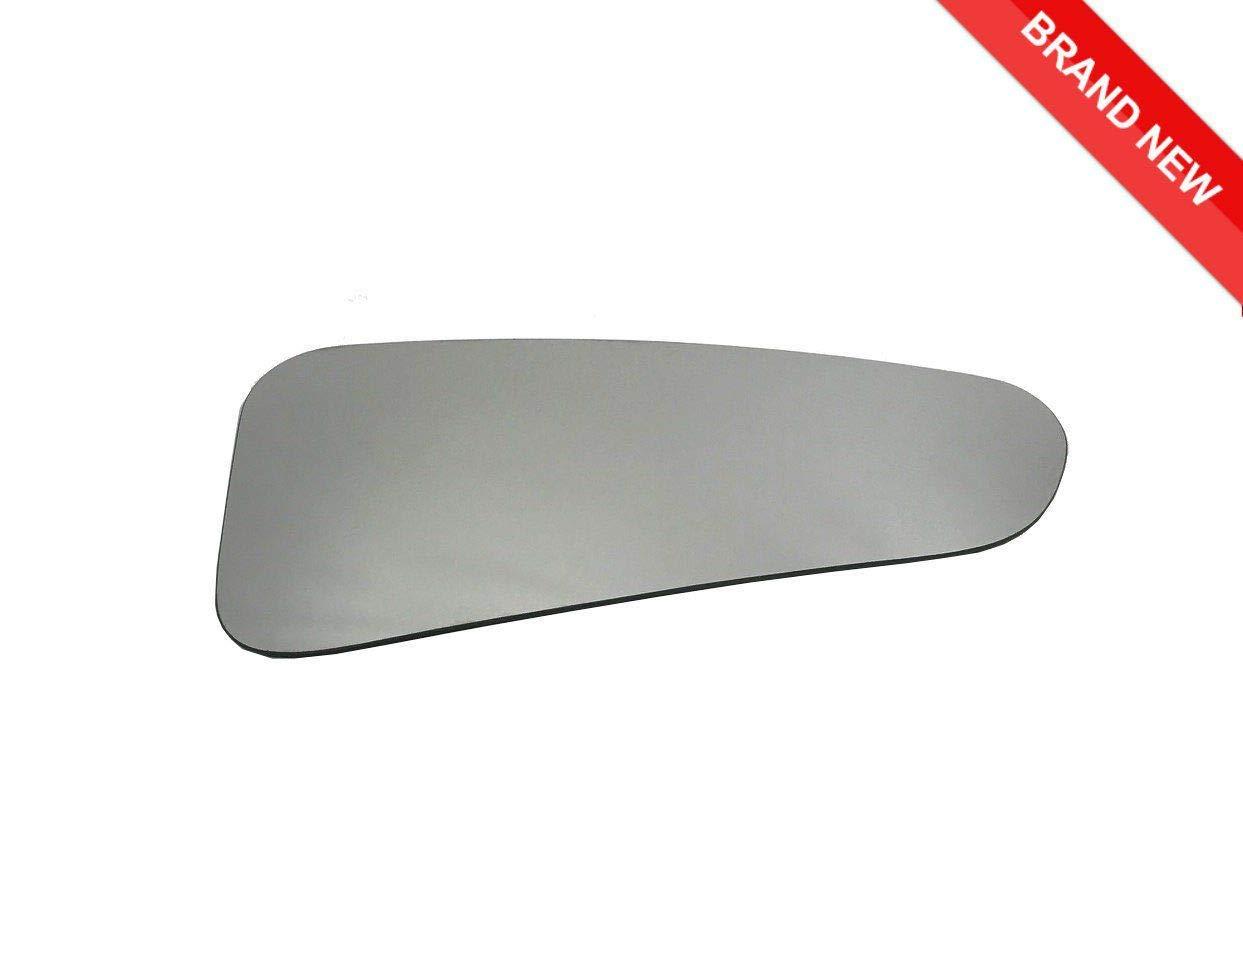 Transit Parts Transit Custom Right Wing Mirror Blind Spot Lower Glass 1766581 2012 On